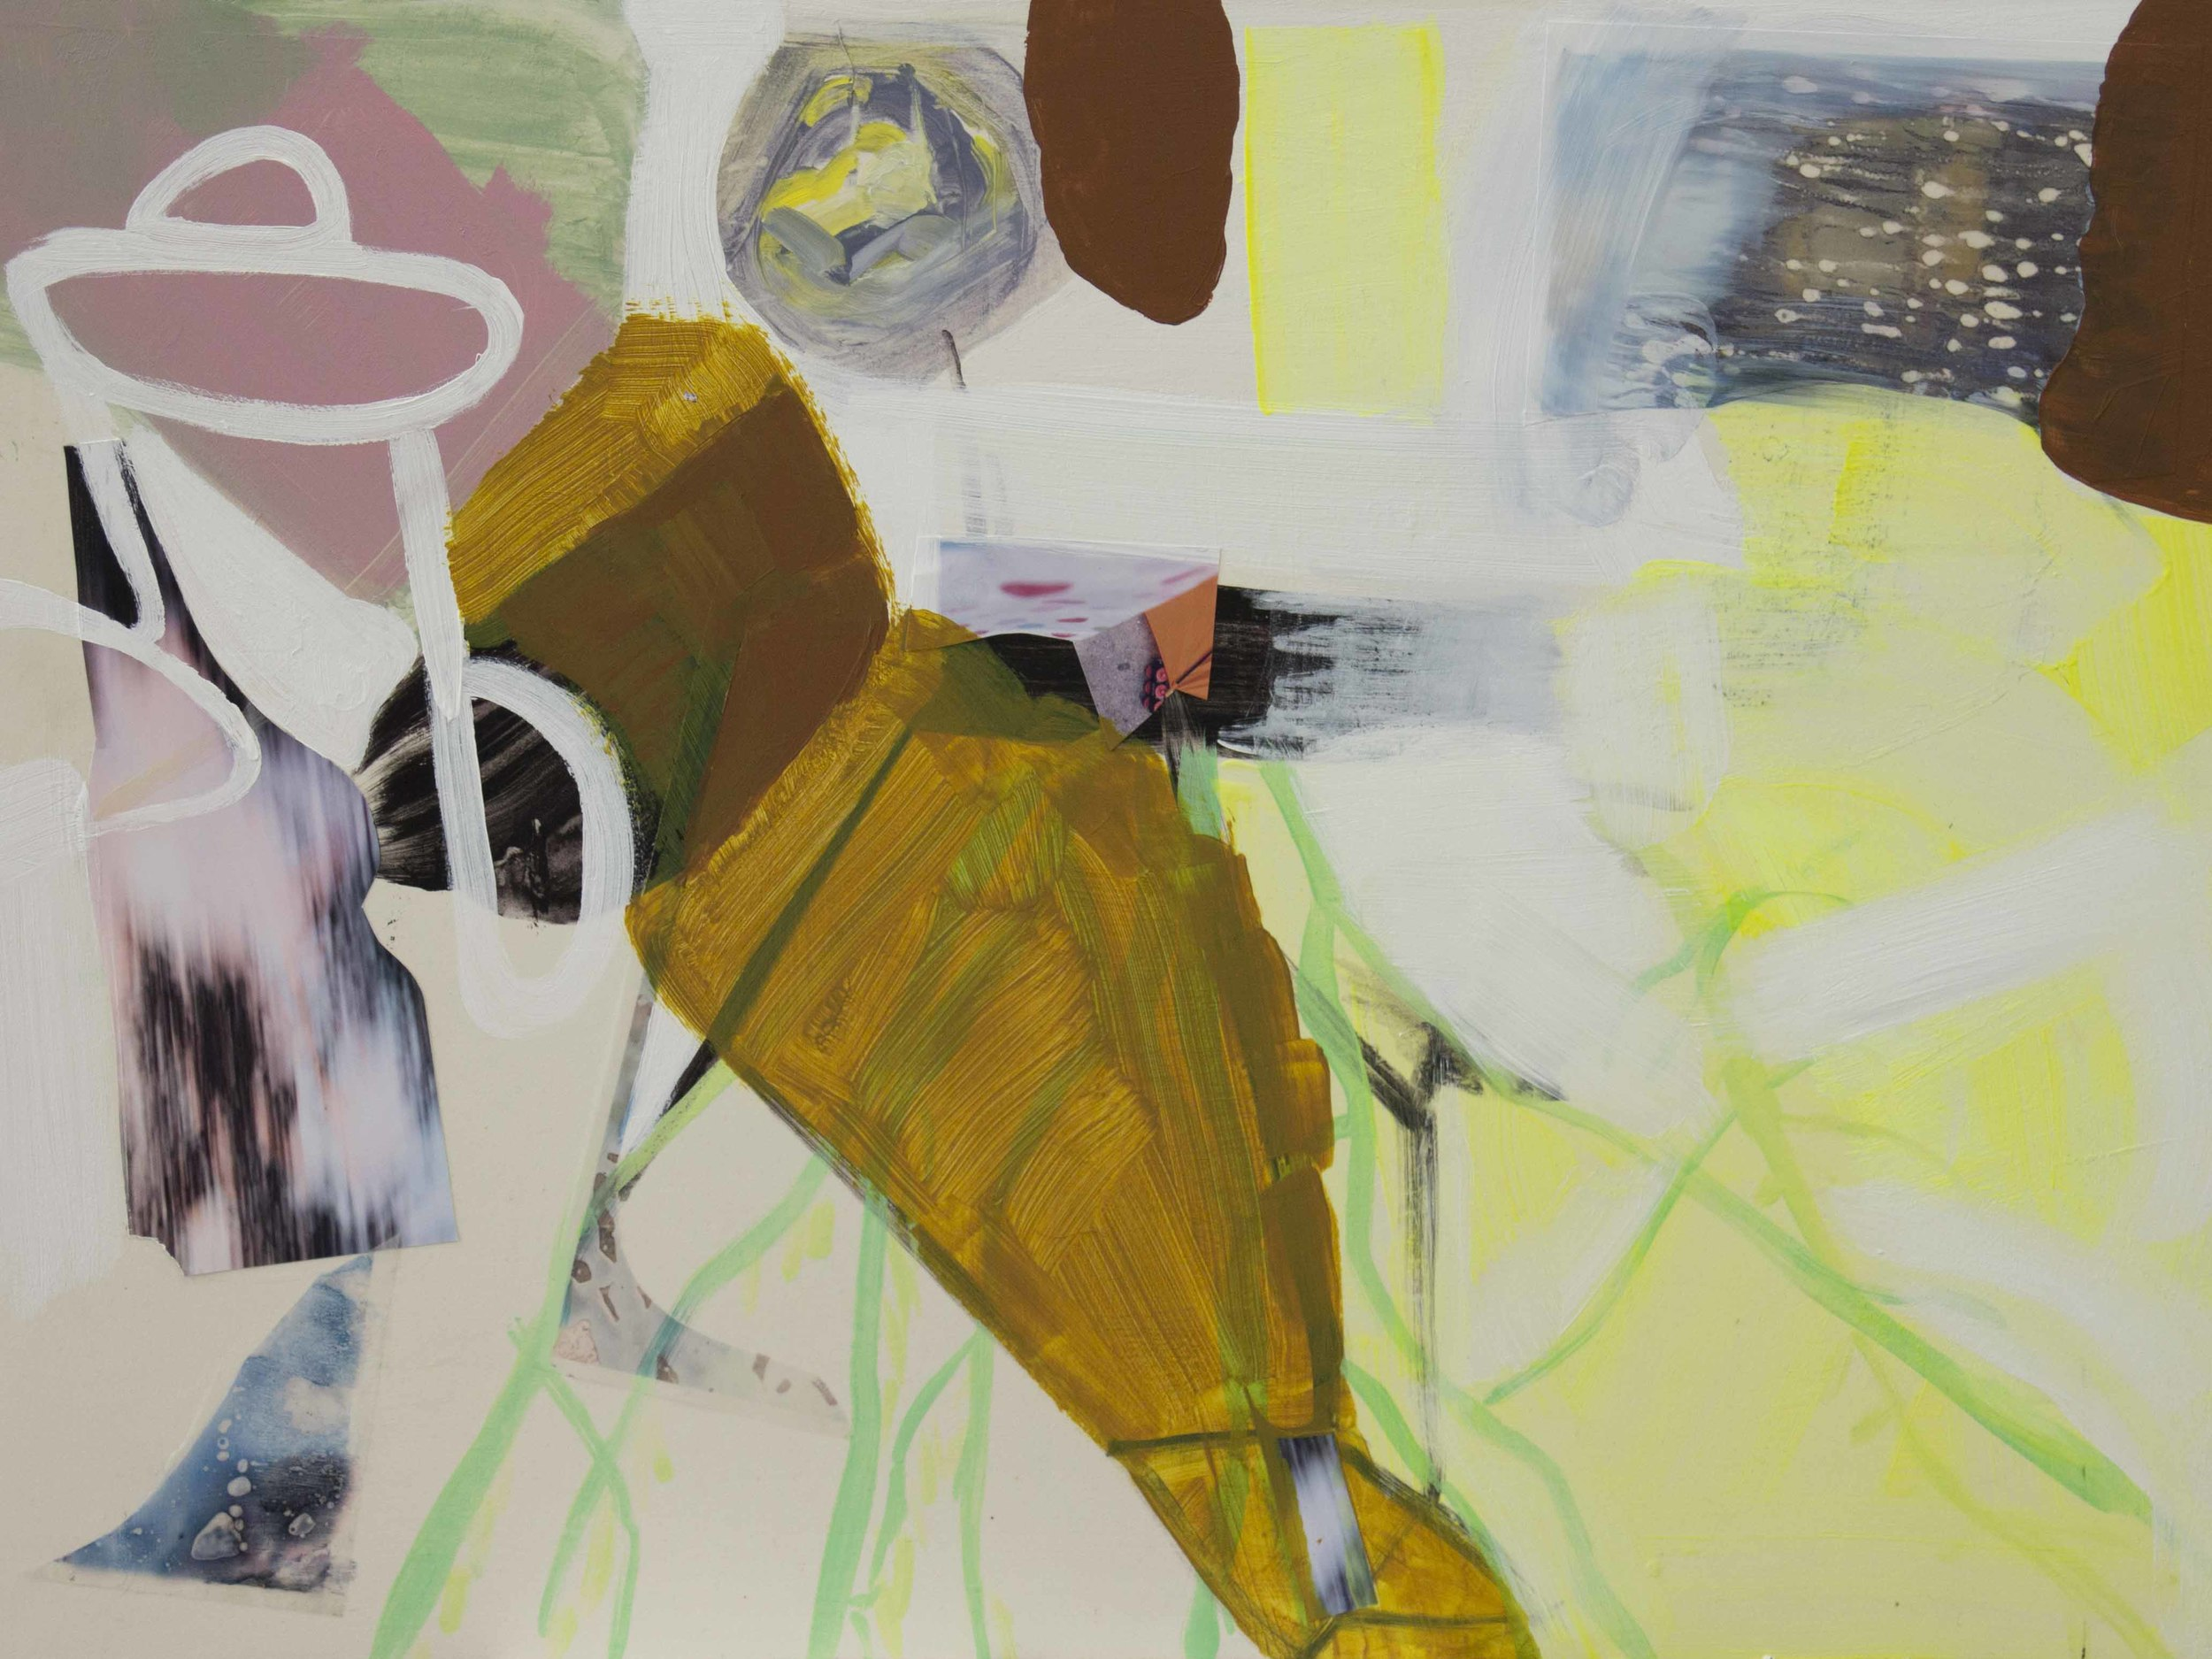 "Wet Spring Acrylic, gouache, digital prints on gesso board 30"" x 22"" 2014"